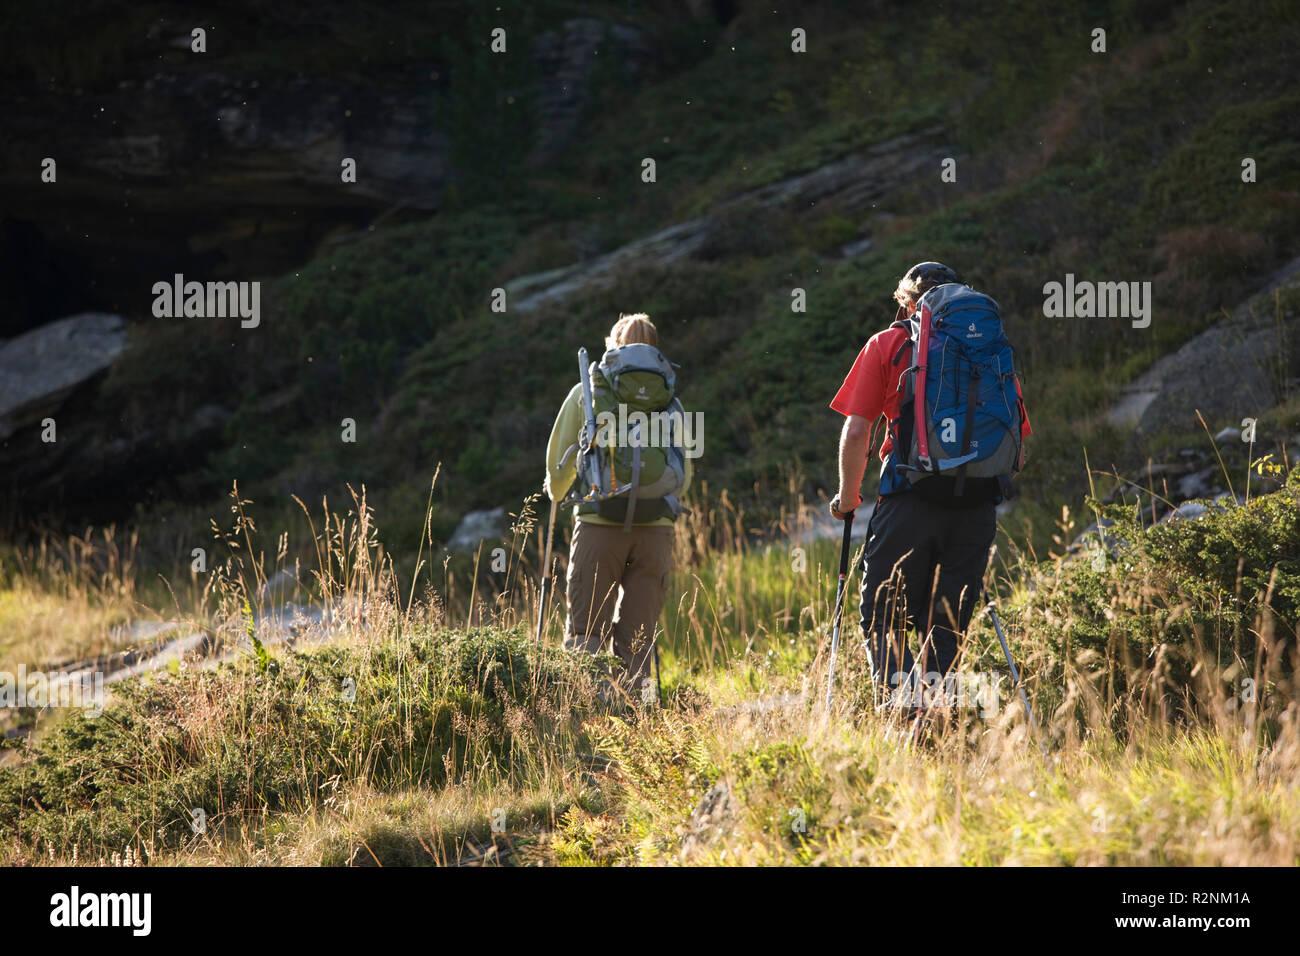 Hiker at the Berliner hut, Zillertal Alps, Tyrol, Austria. Stock Photo